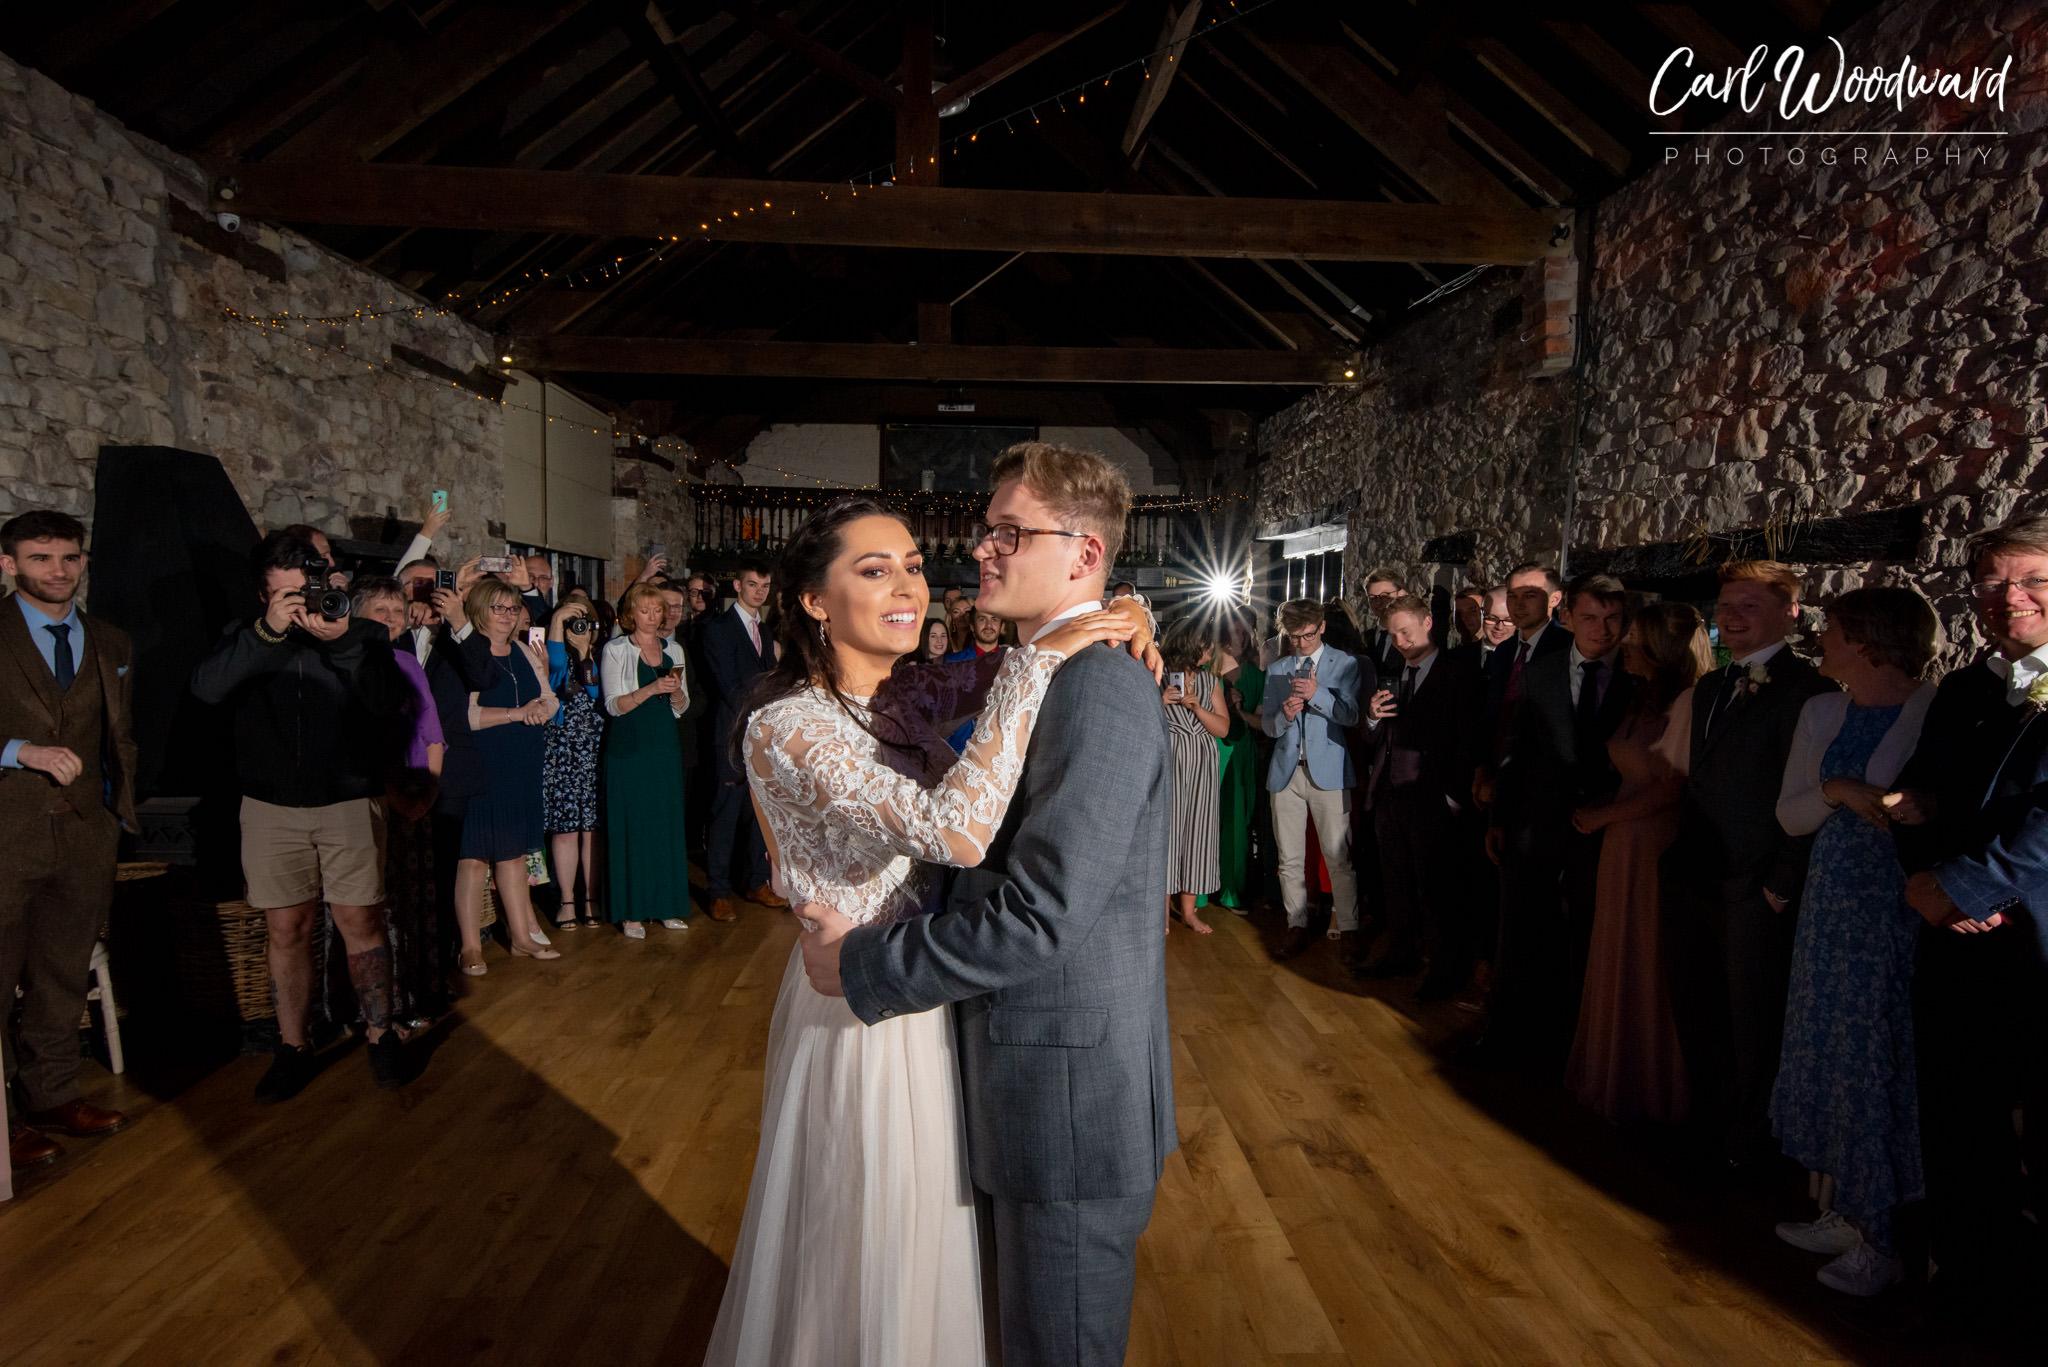 024-pencoed-house-estate-wedding-wedding-photography-cardiff-wedding-photographer.jpg